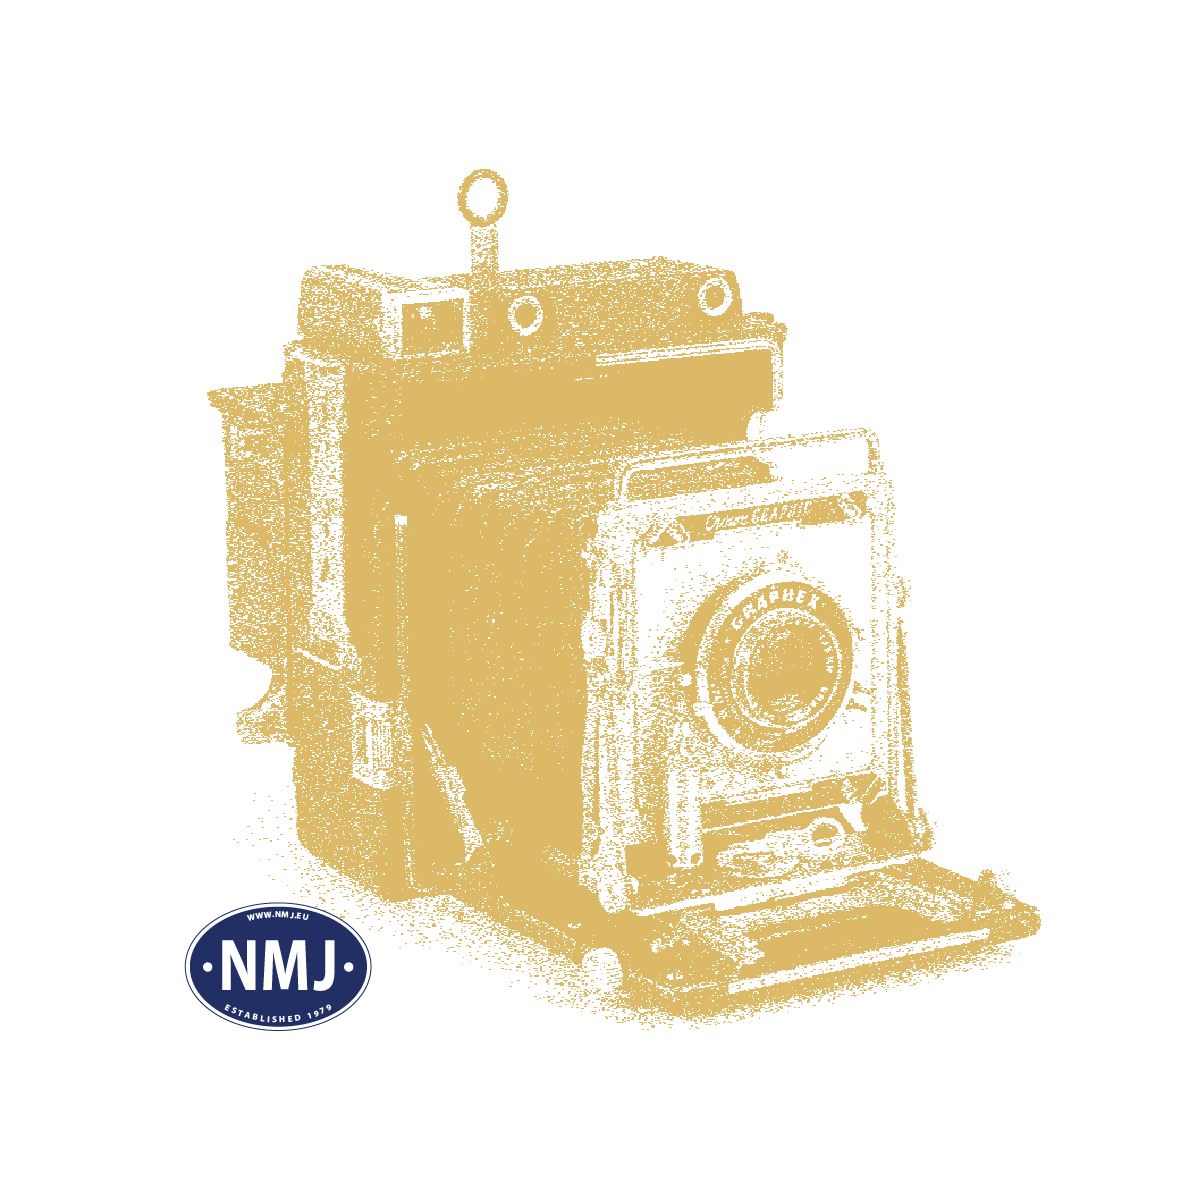 NMJT132.201 - NMJ Topline NSB B4 25951, Intermediate design